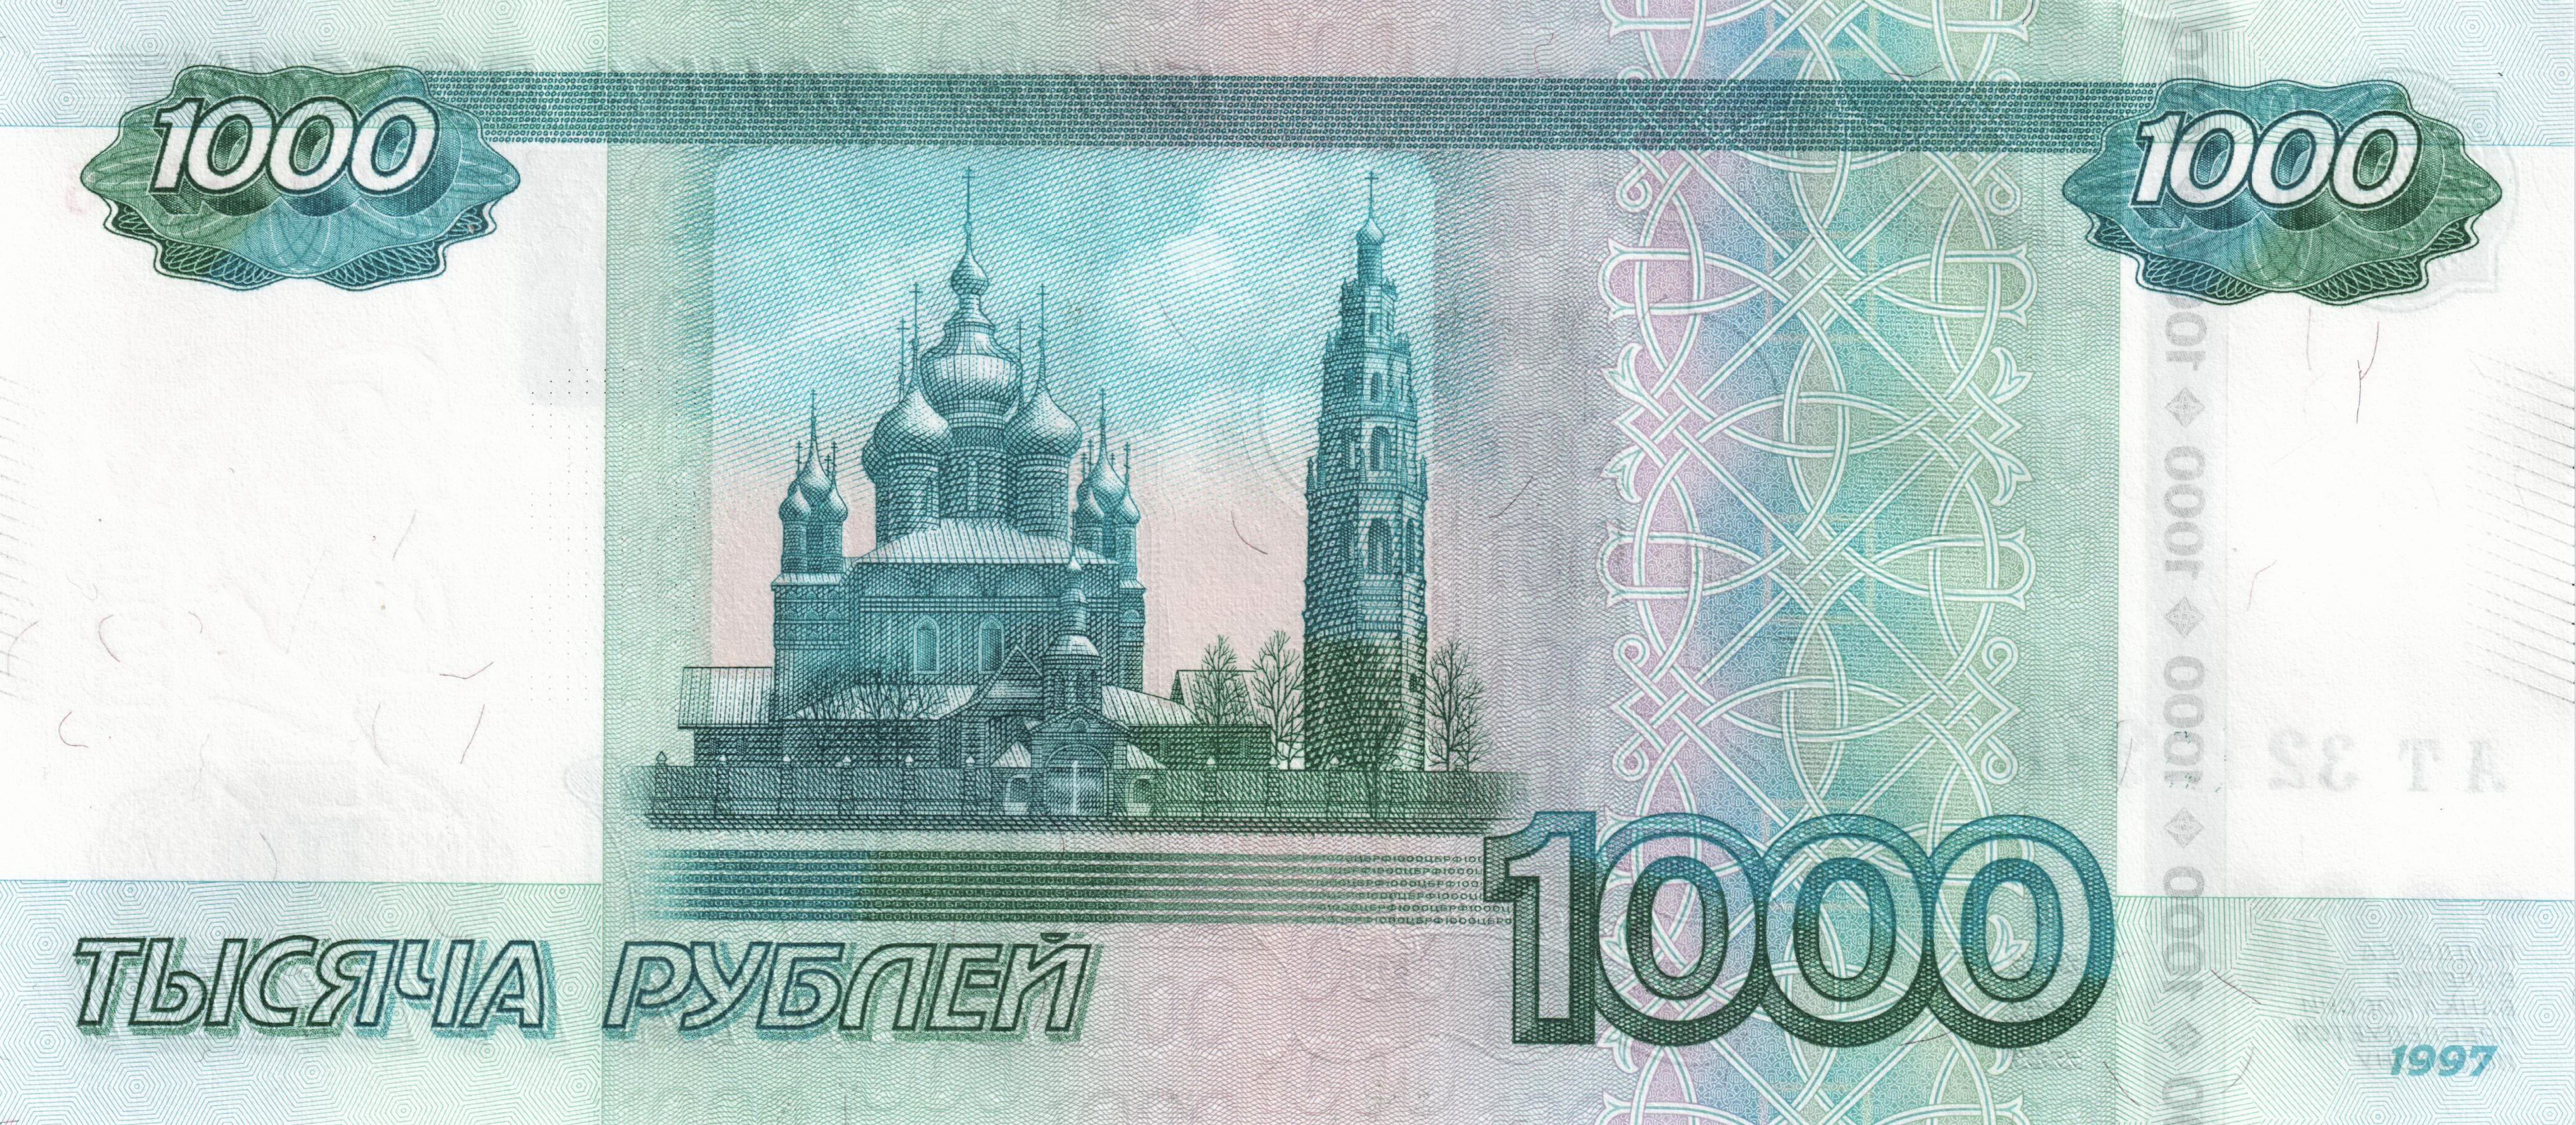 Изображение - Кто изображен на 1000 рублевой купюре Banknote_1000_rubles_2010_back